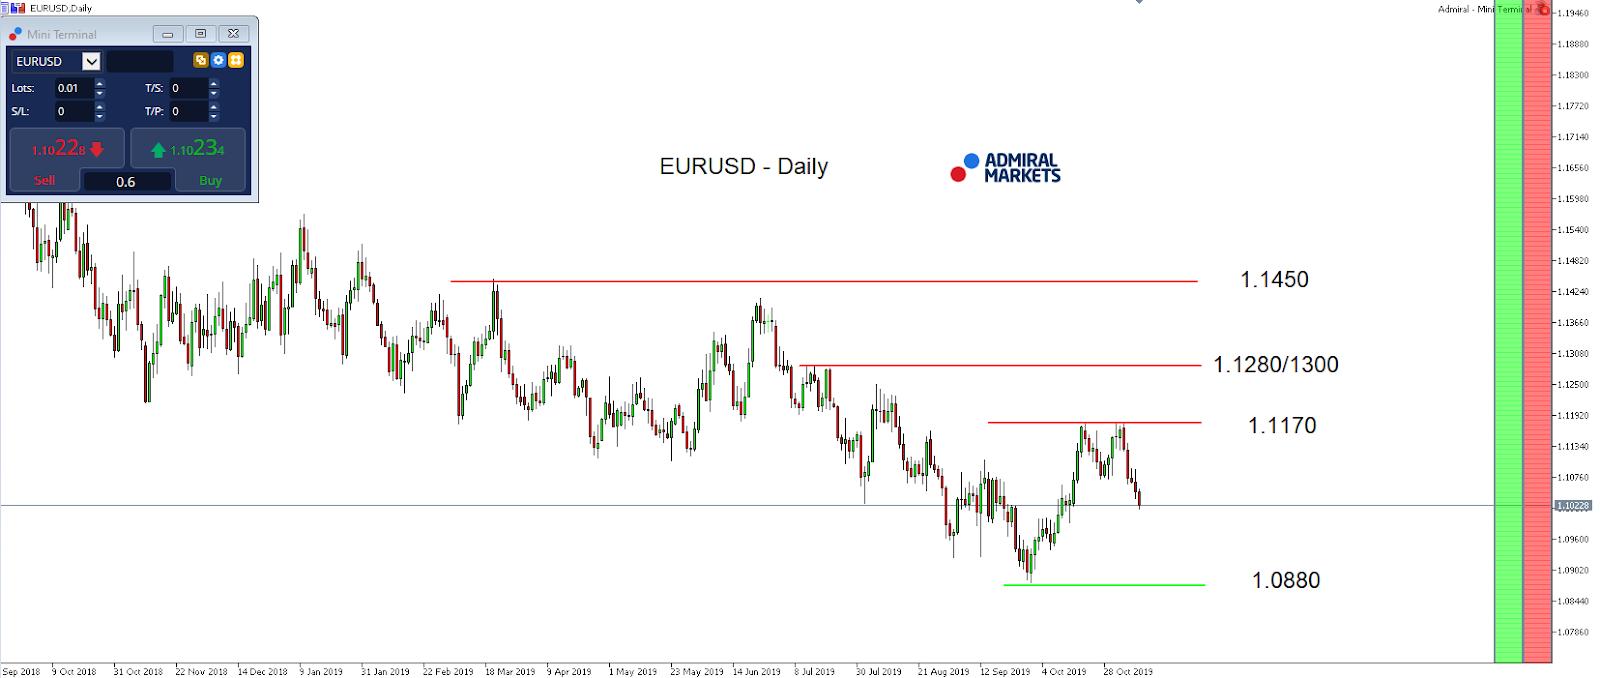 EURUSD- Daily chart